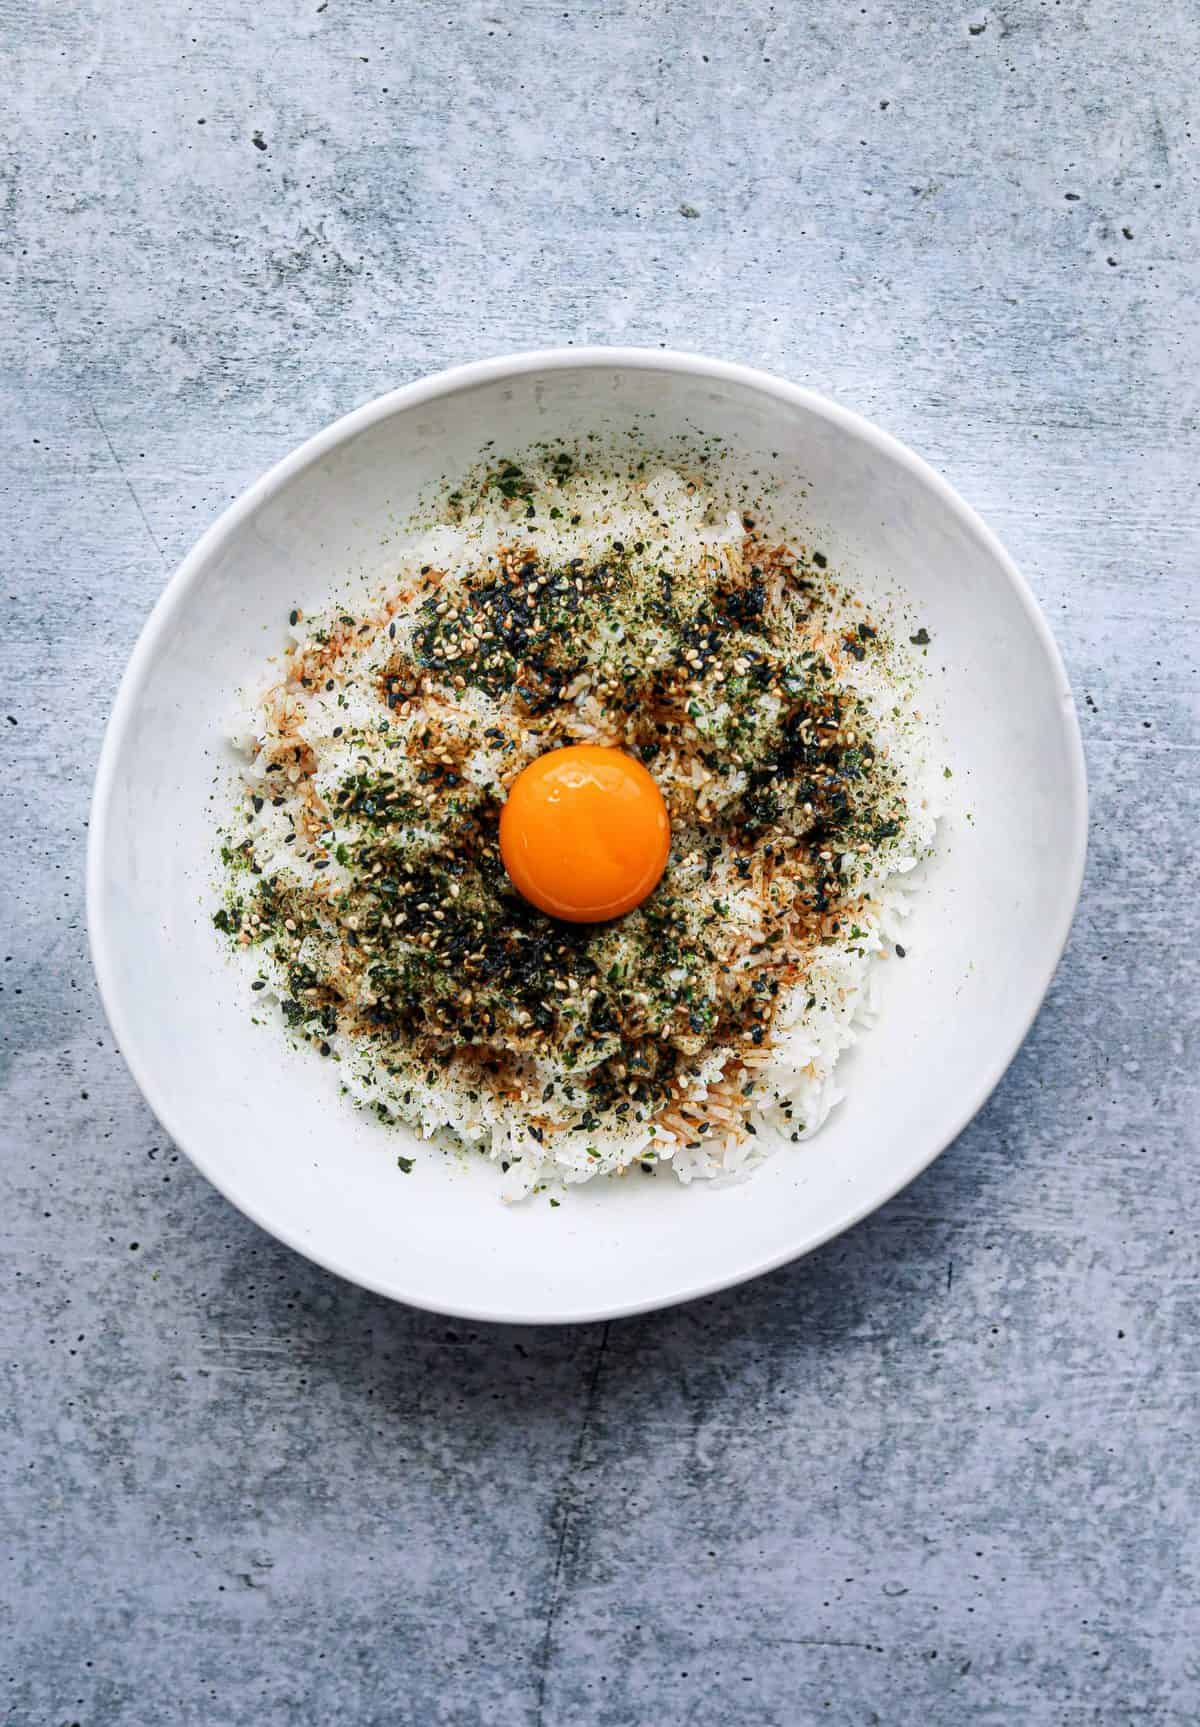 a white bowl with rice, furikake seasoning and an egg yolk